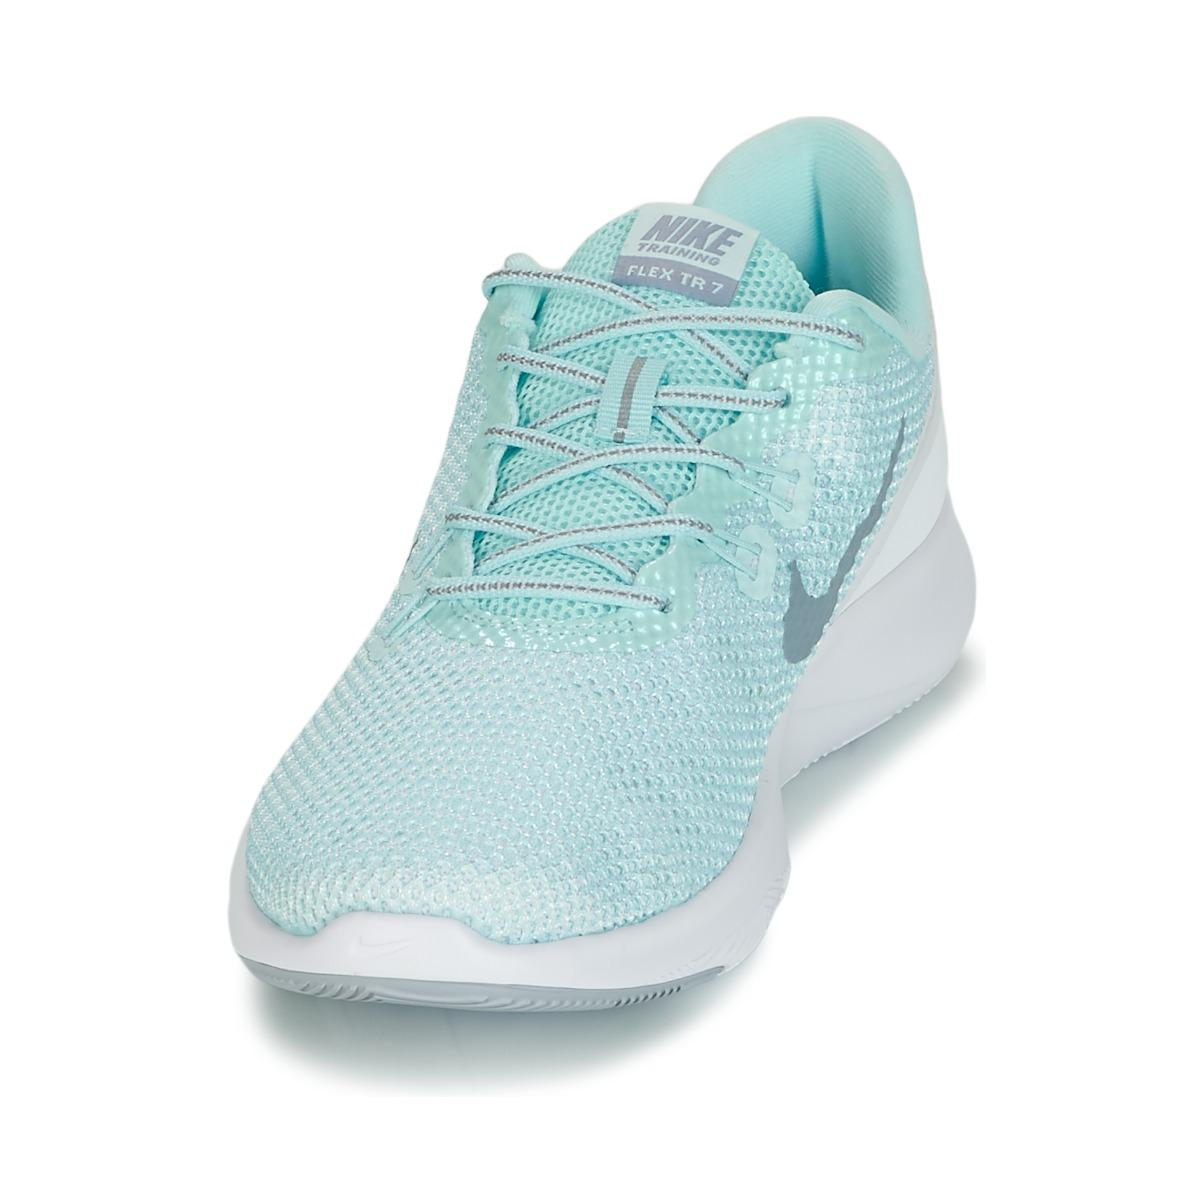 Flex Ladies 7 Nike Trainer Trainers 6dwqPq